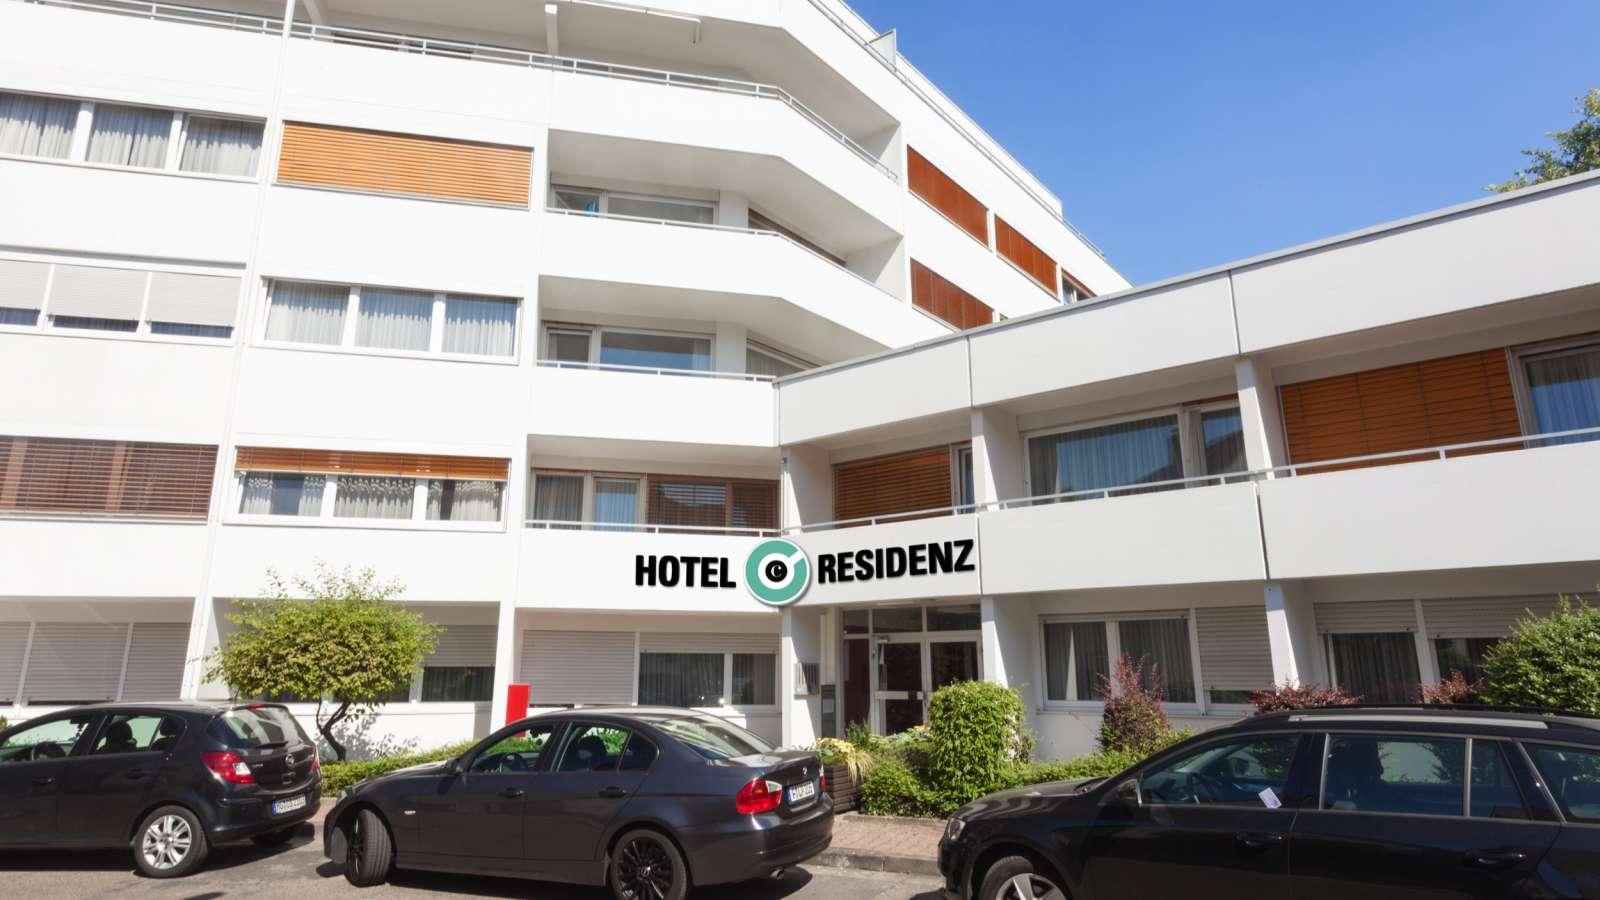 Centro hotels frankfurt am main for Designhotel residenz 2000 berlin